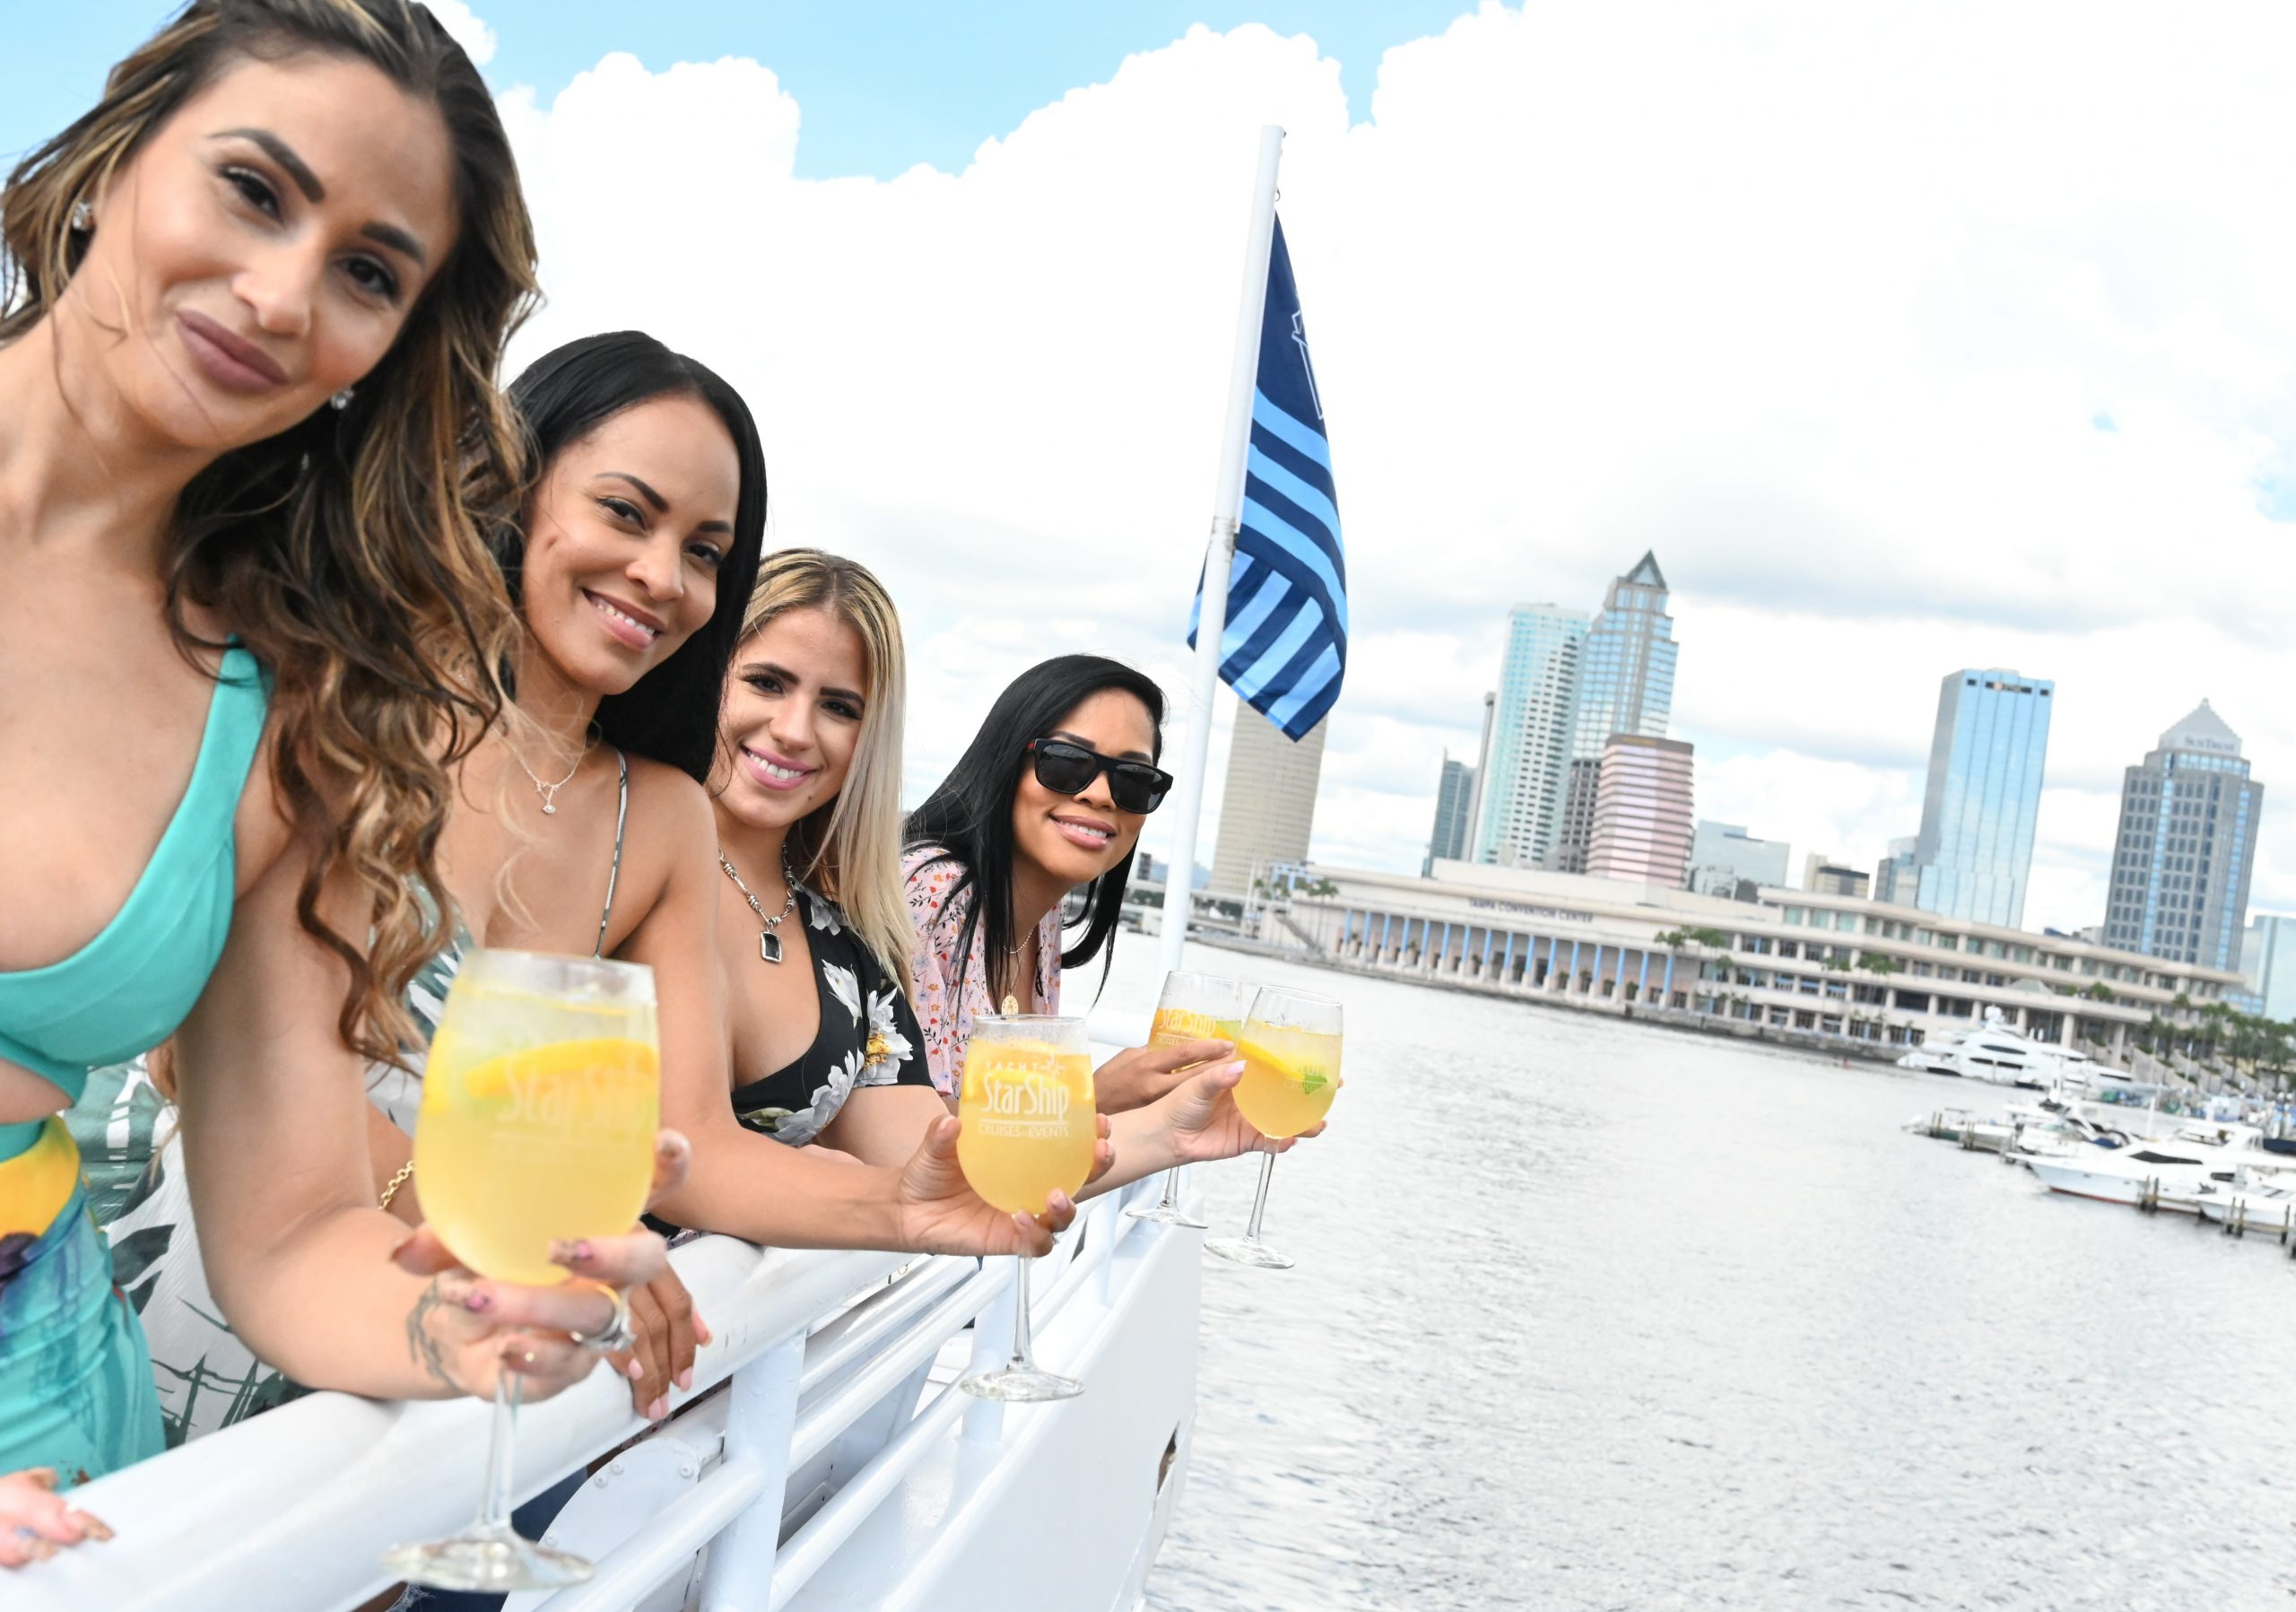 DJ Entertainment aboard Yacht StarShip